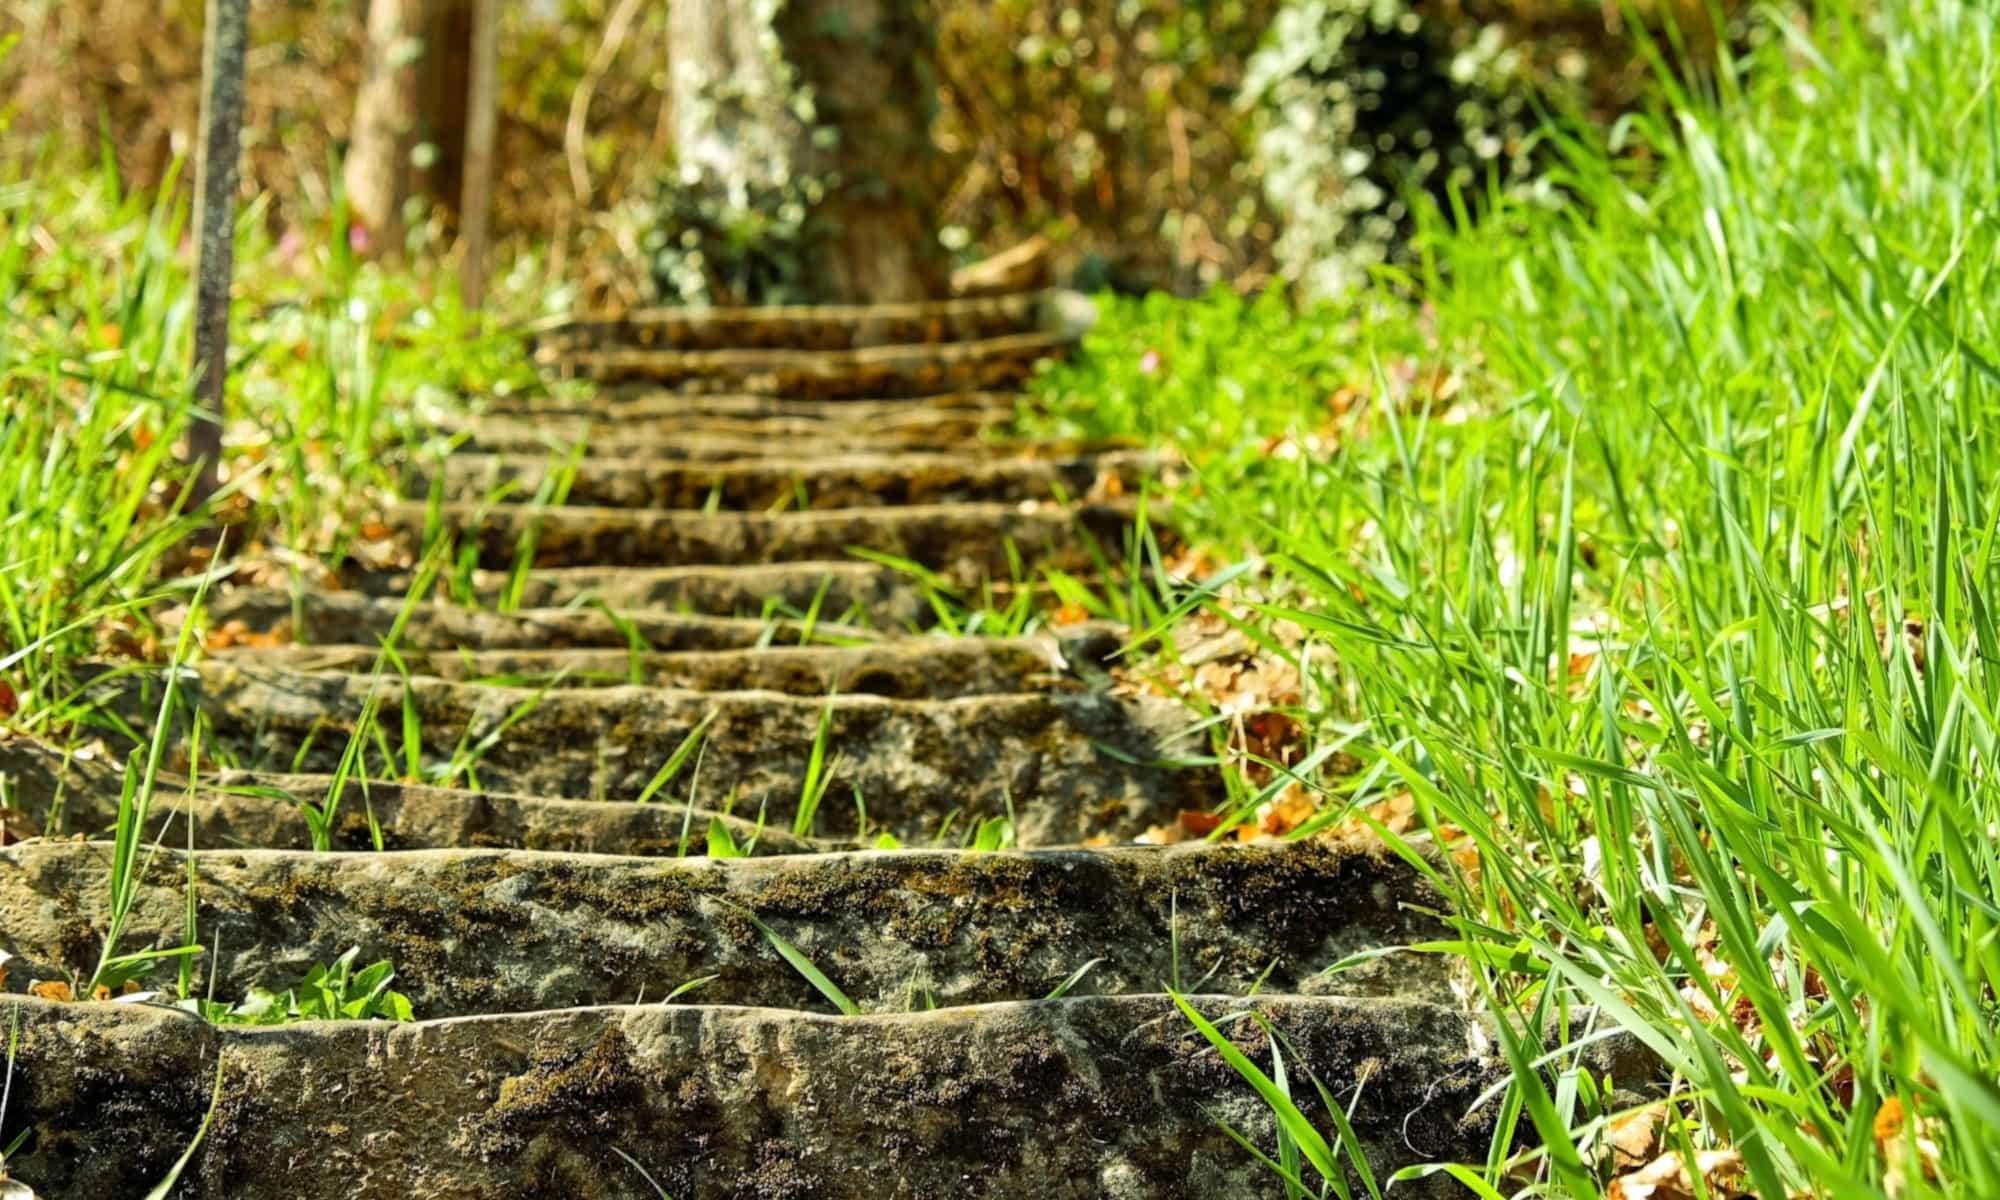 Treppe in der Natur